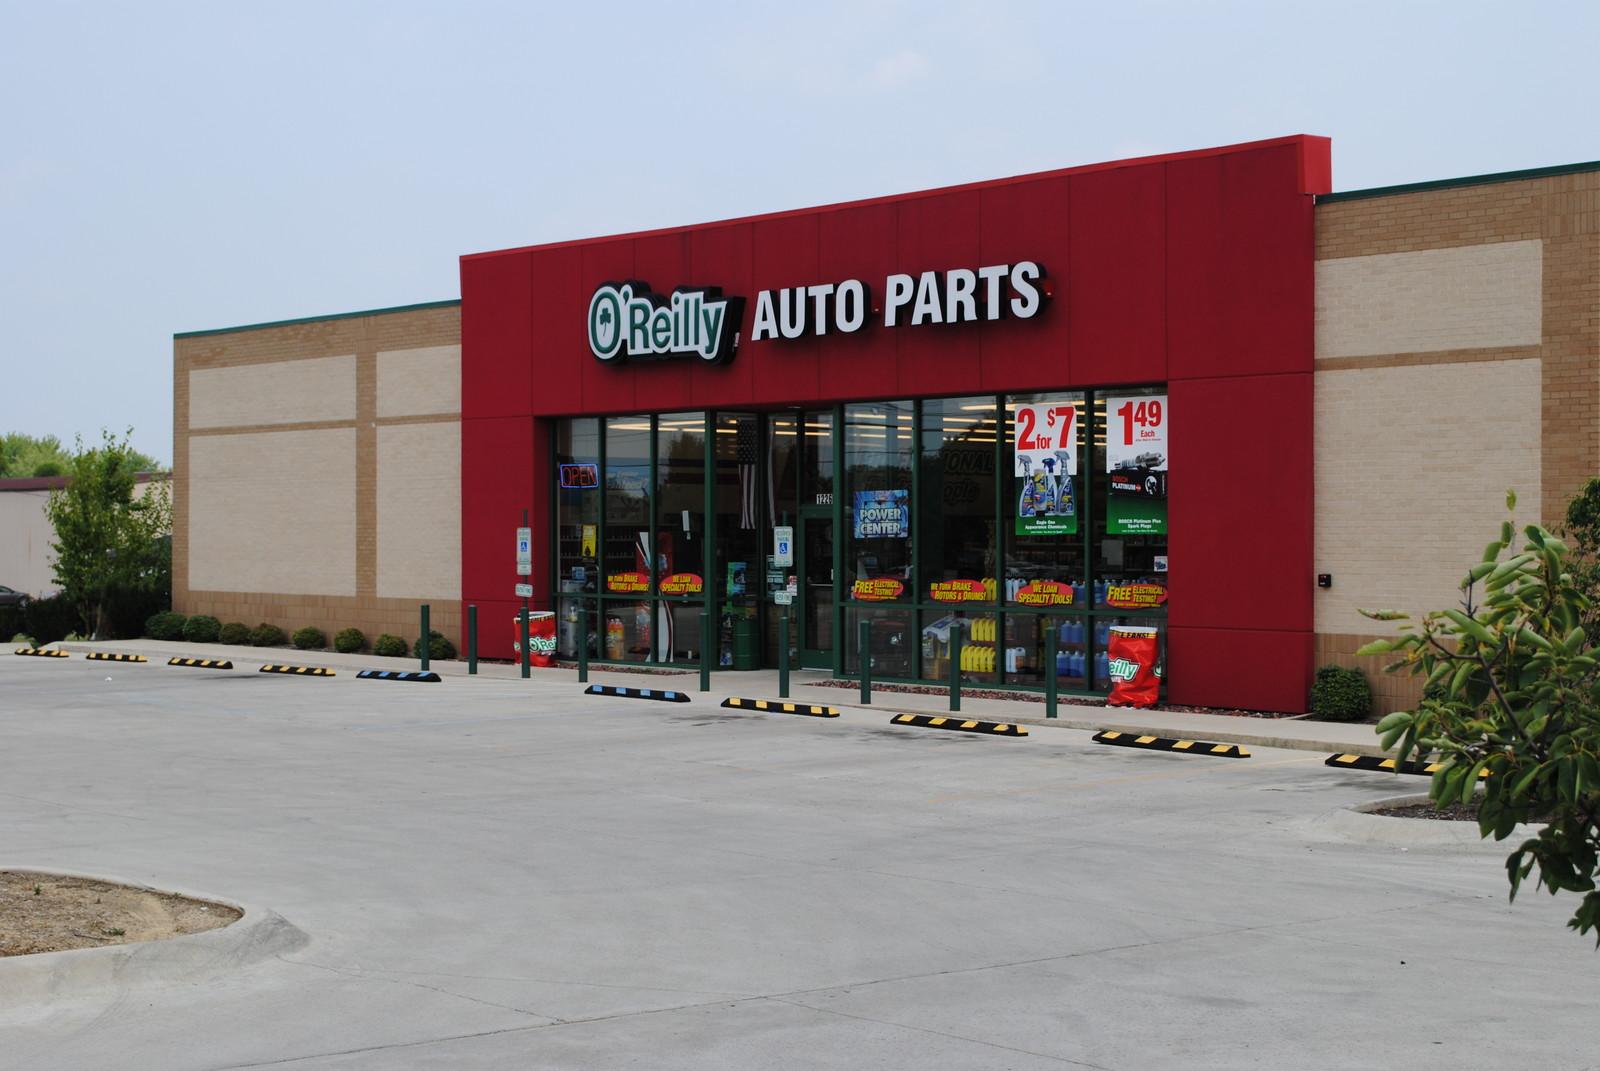 Oreillys Auto Parts